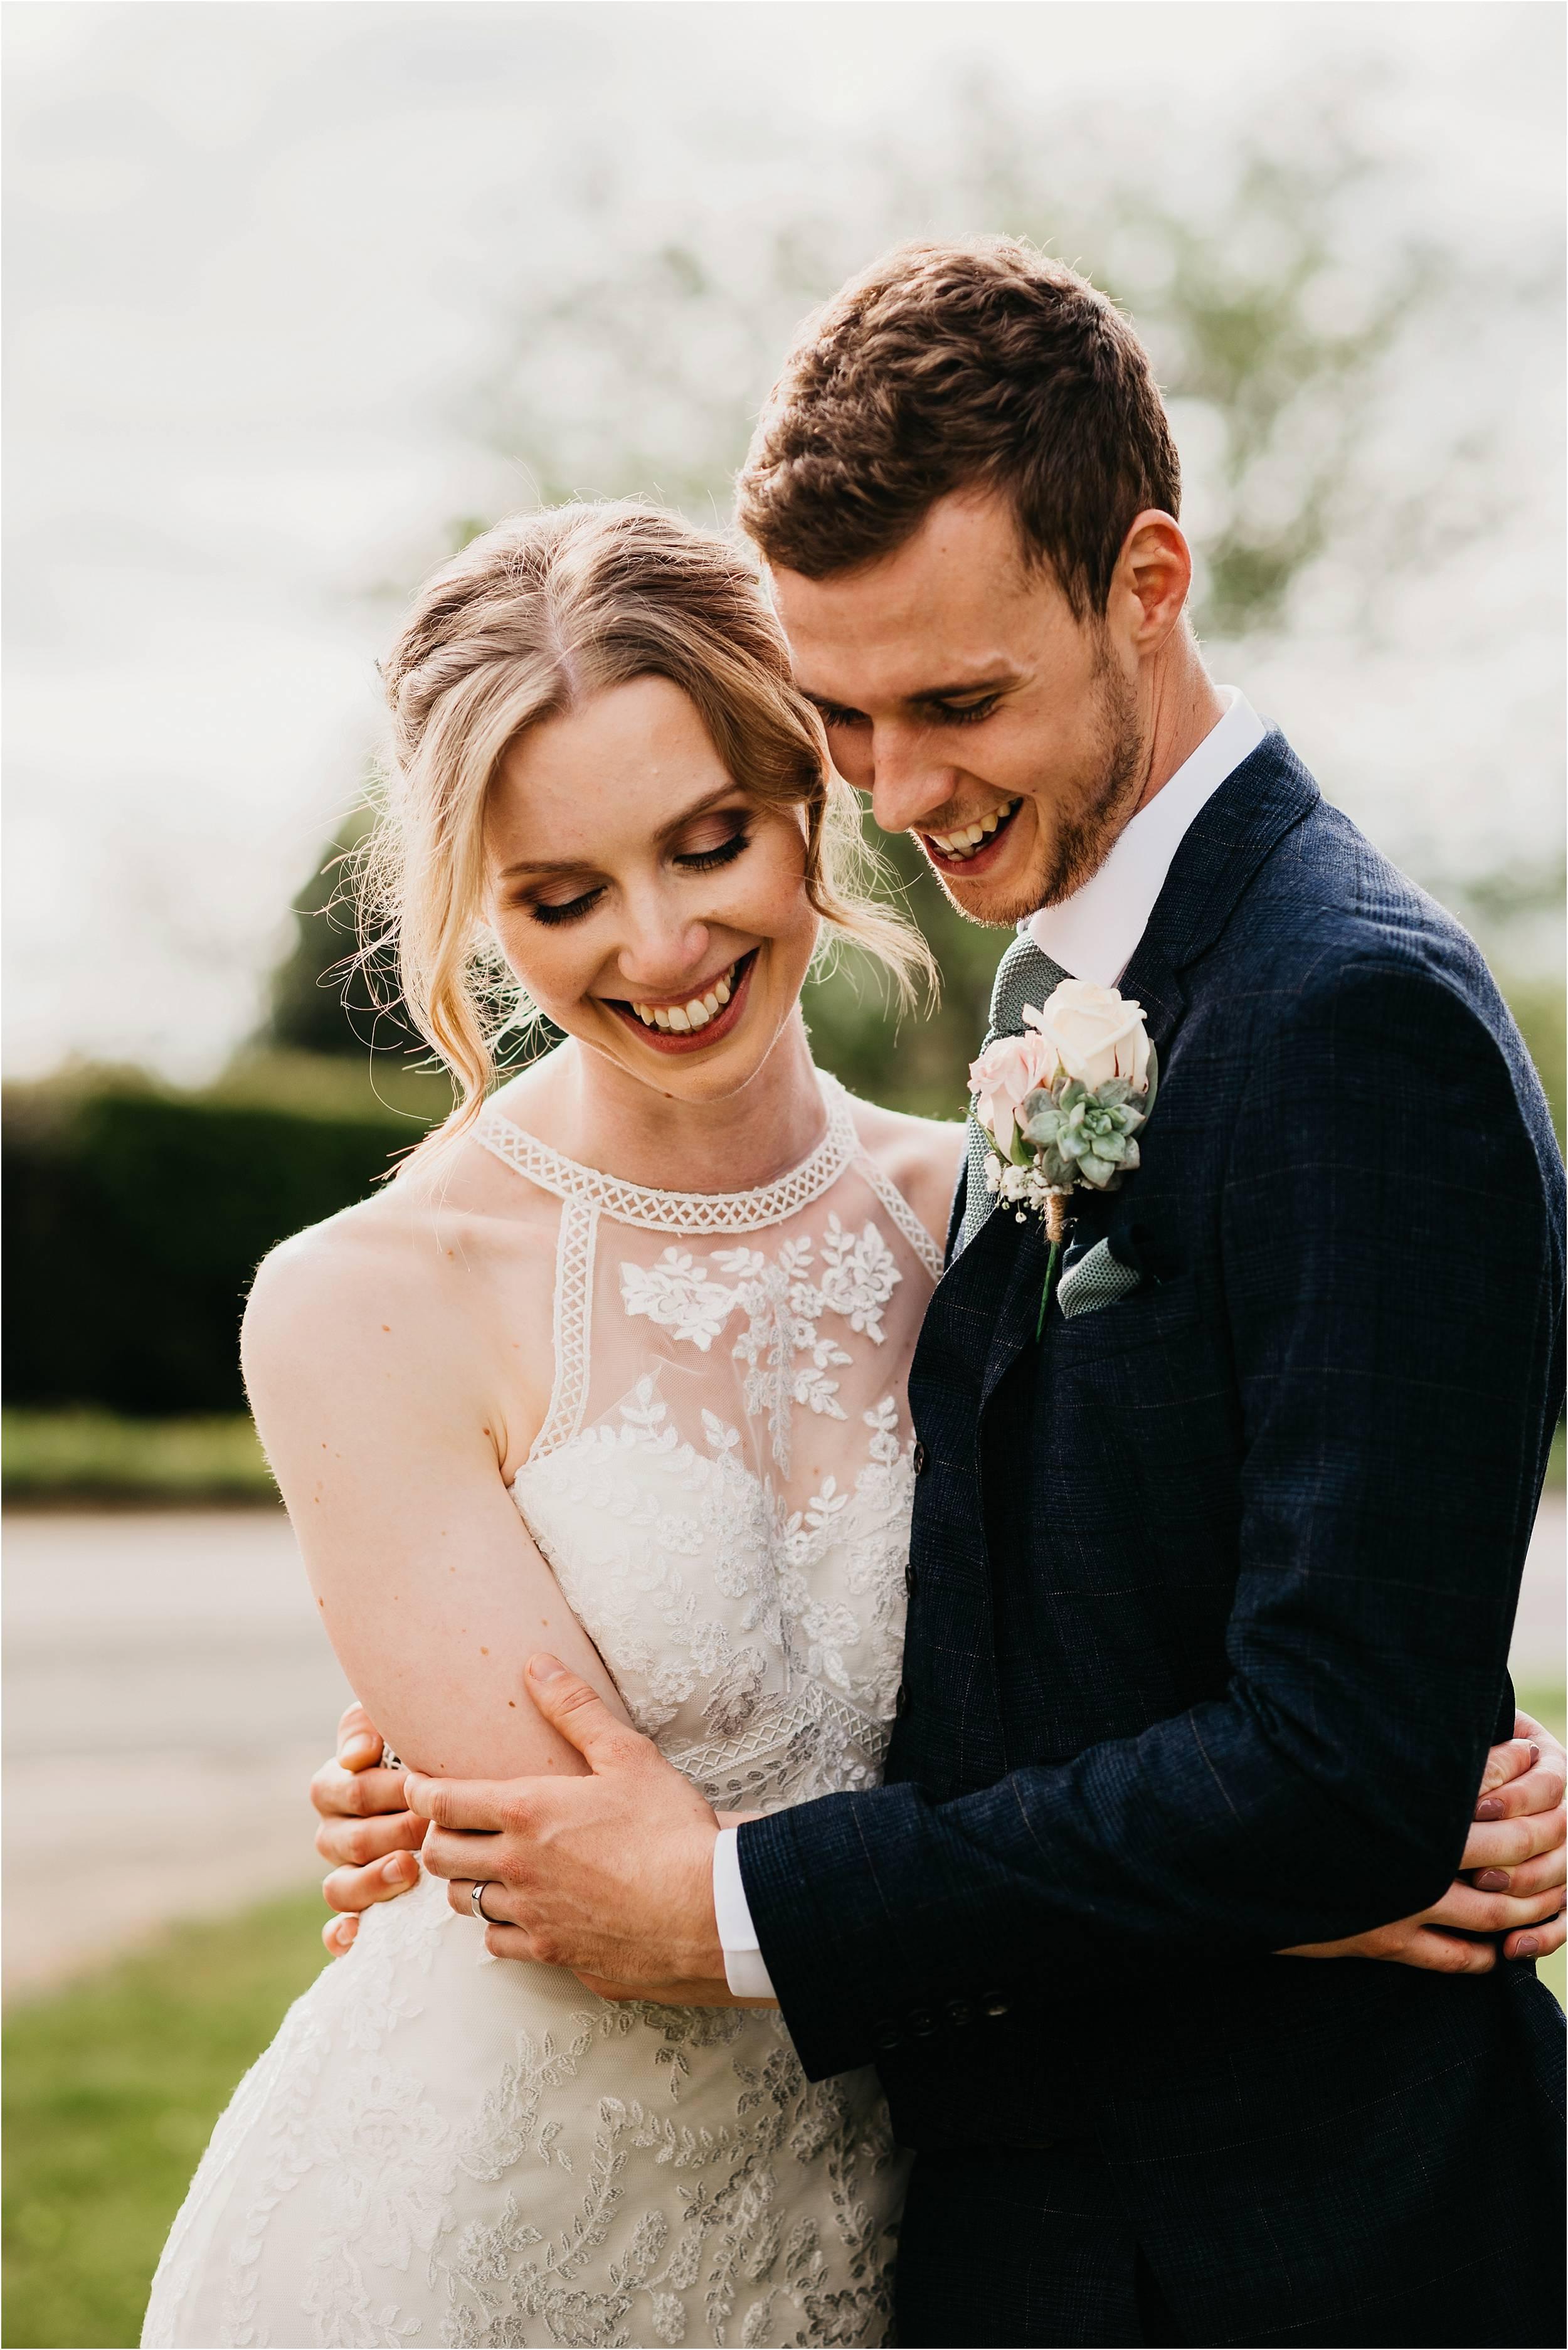 Kedleston Country House Wedding Photography_0079.jpg